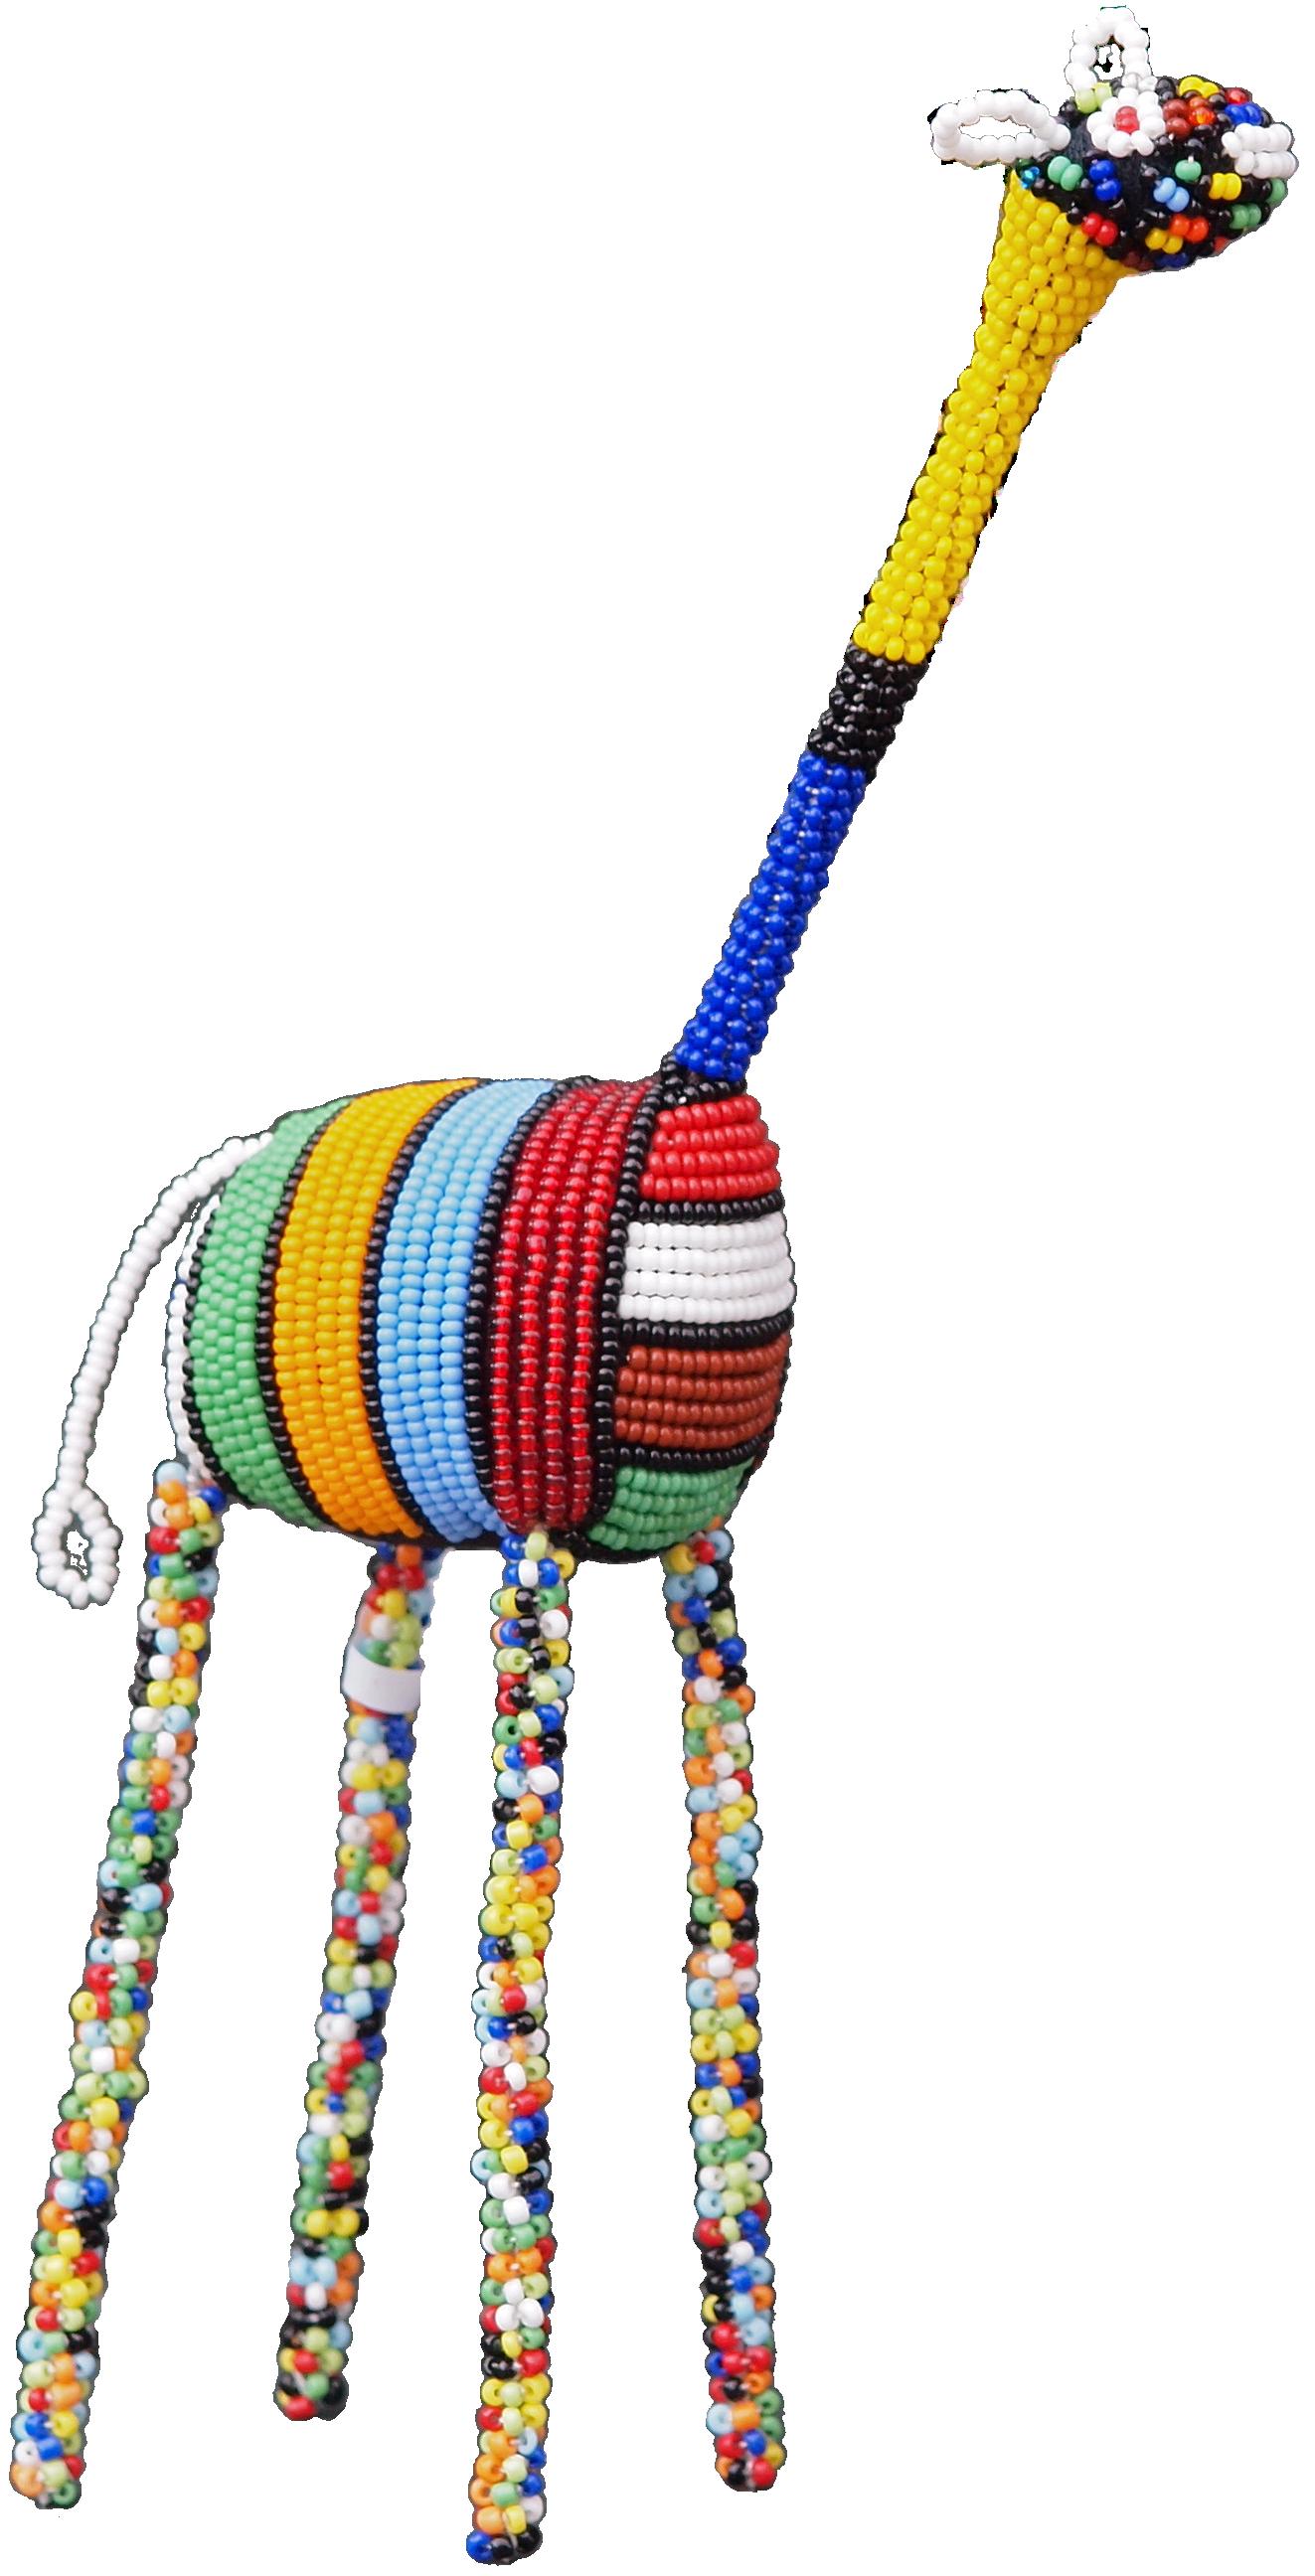 Edited_Beaded Giraffe (2).png